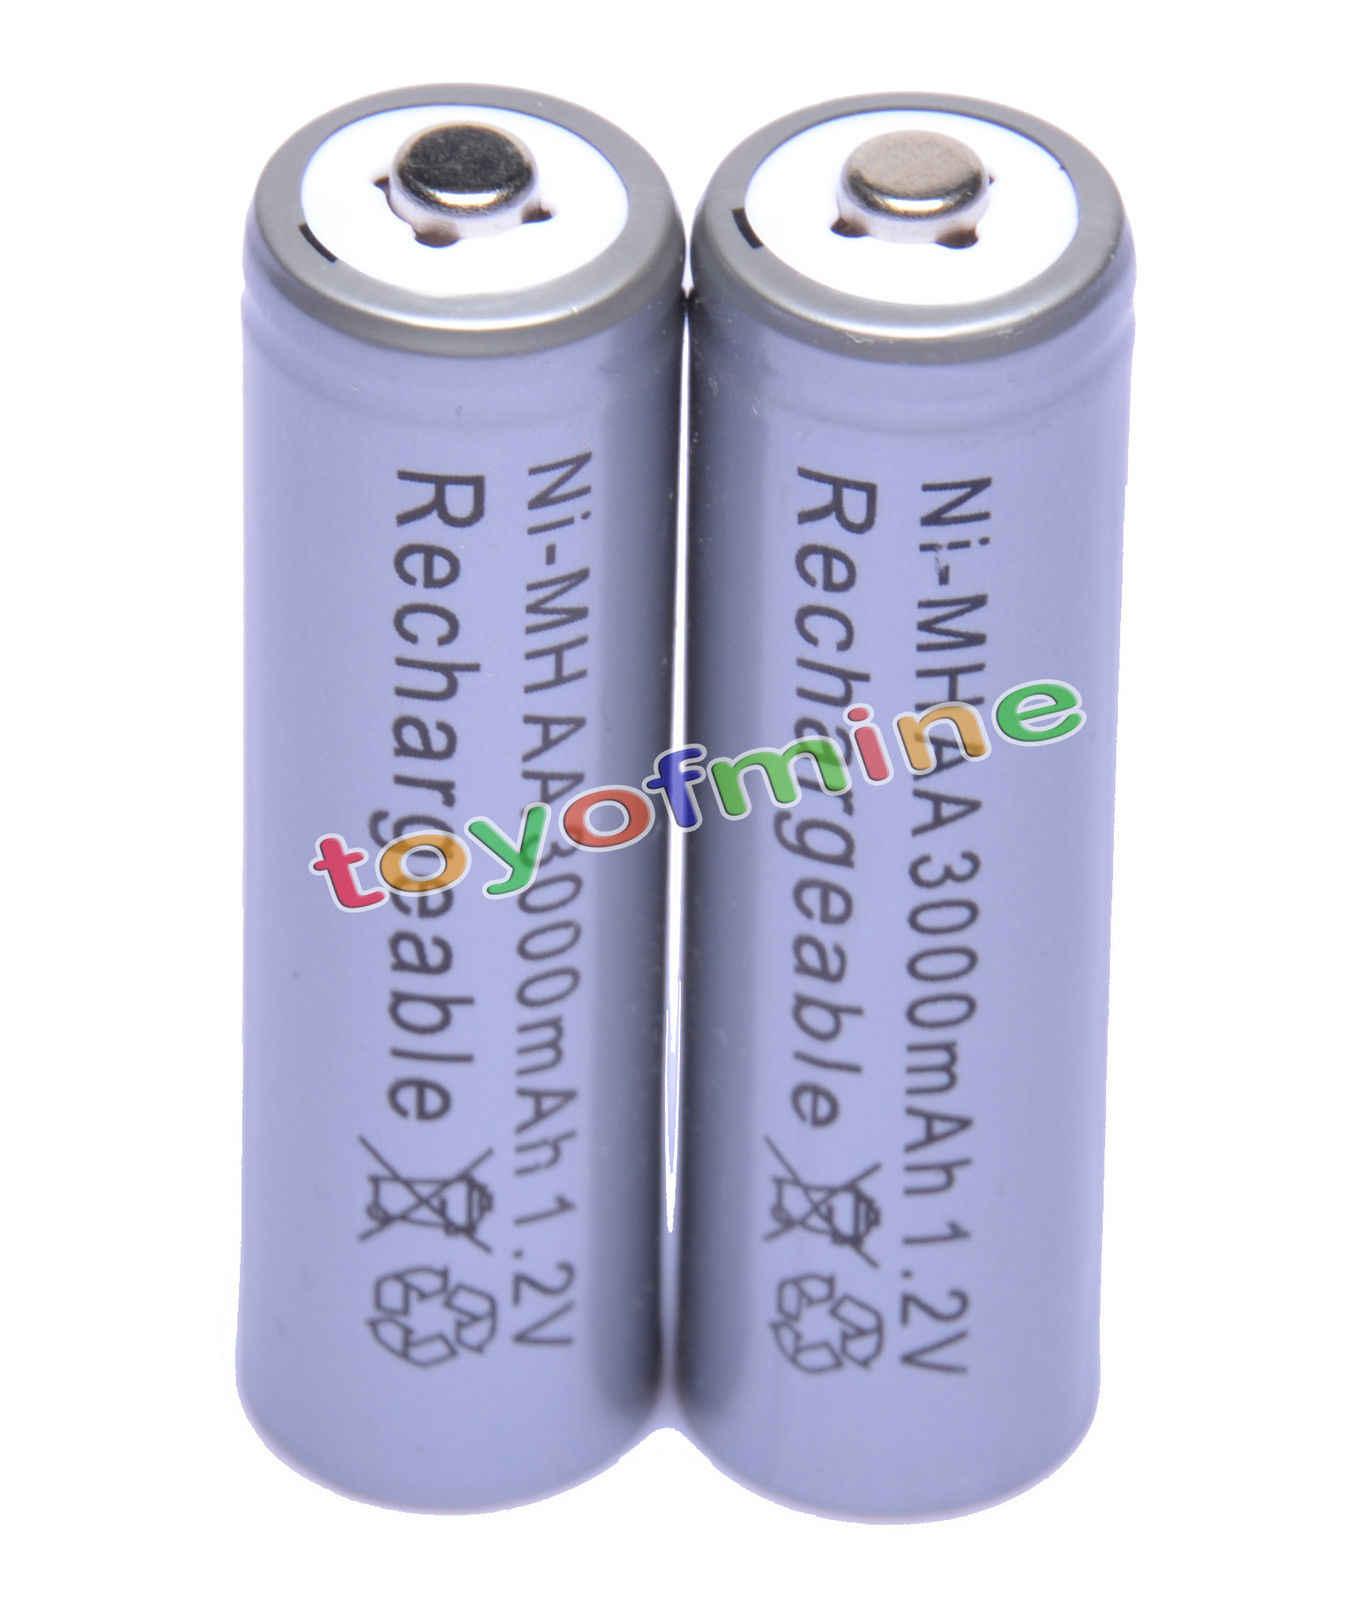 2x AA батареи оптом никель гидрид Перезаряжаемые Ni-MH 3000 mAh 1,2 V серый